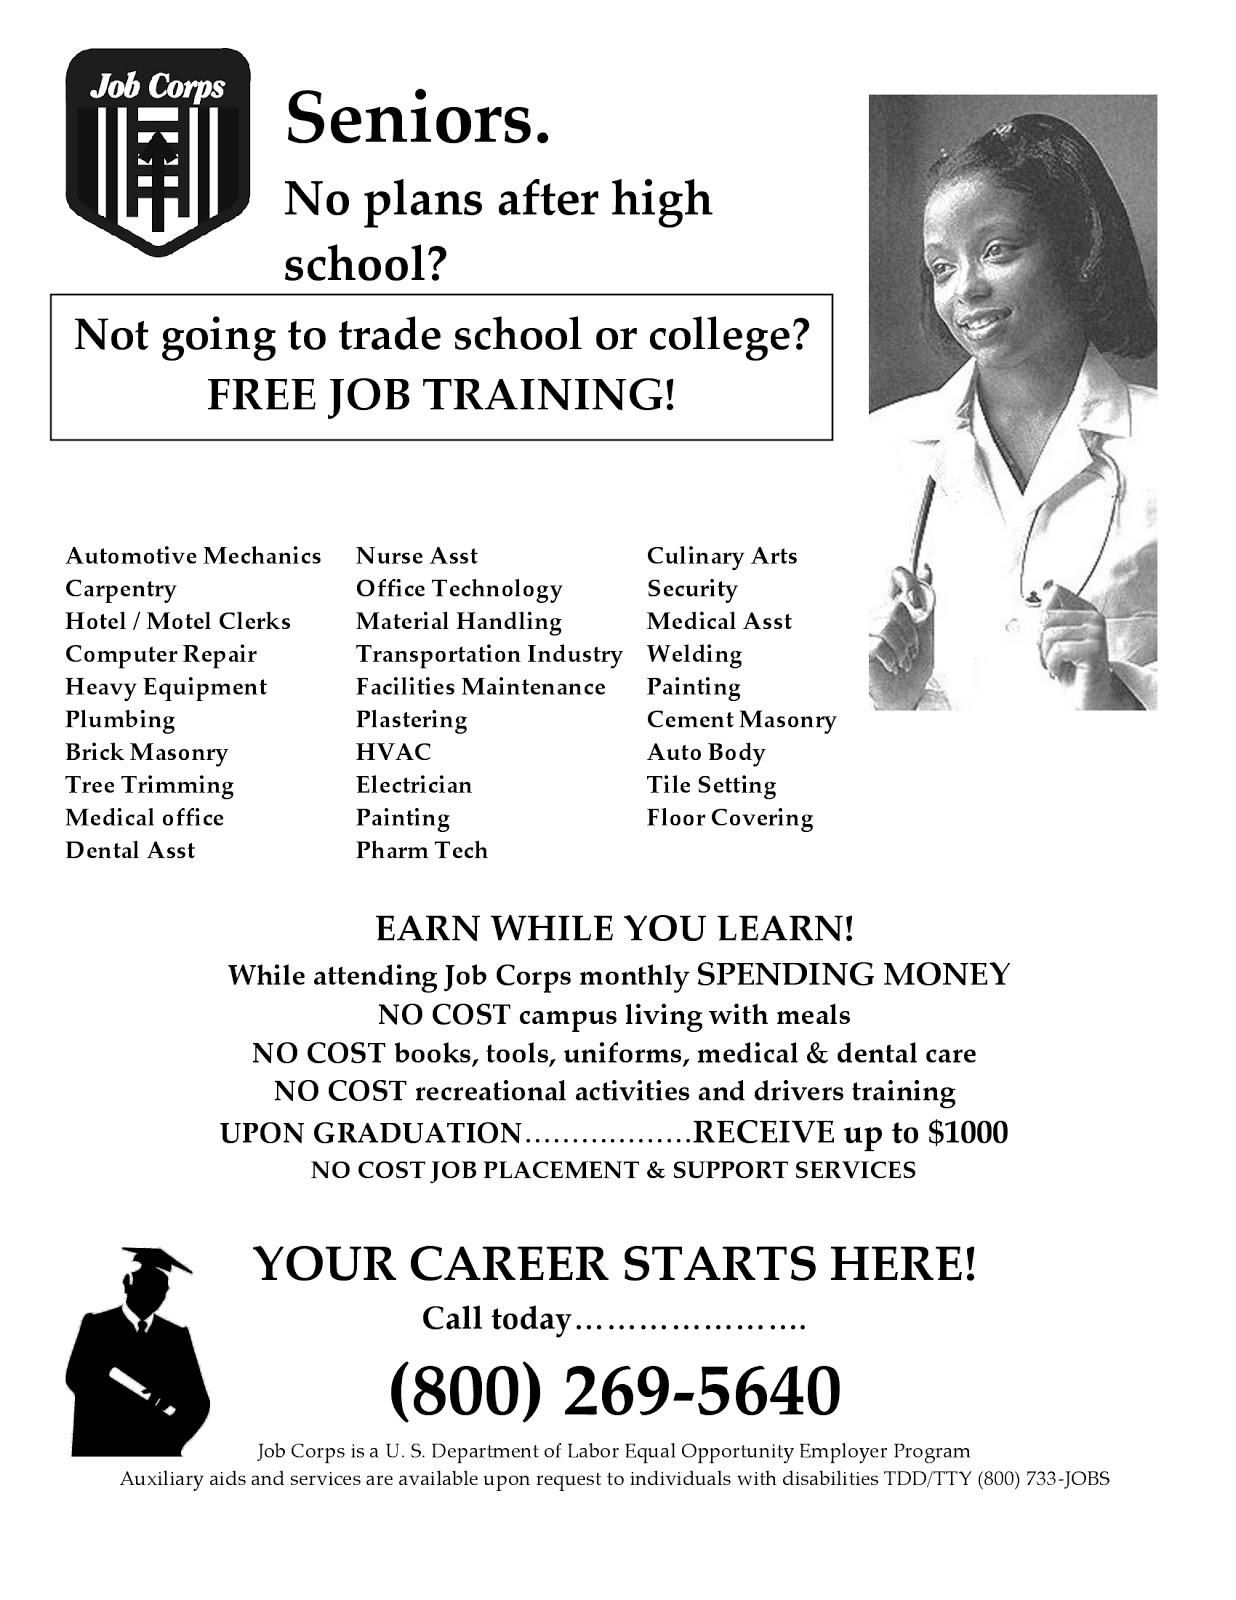 fresh start outreach ministry job corps job training job corps job training